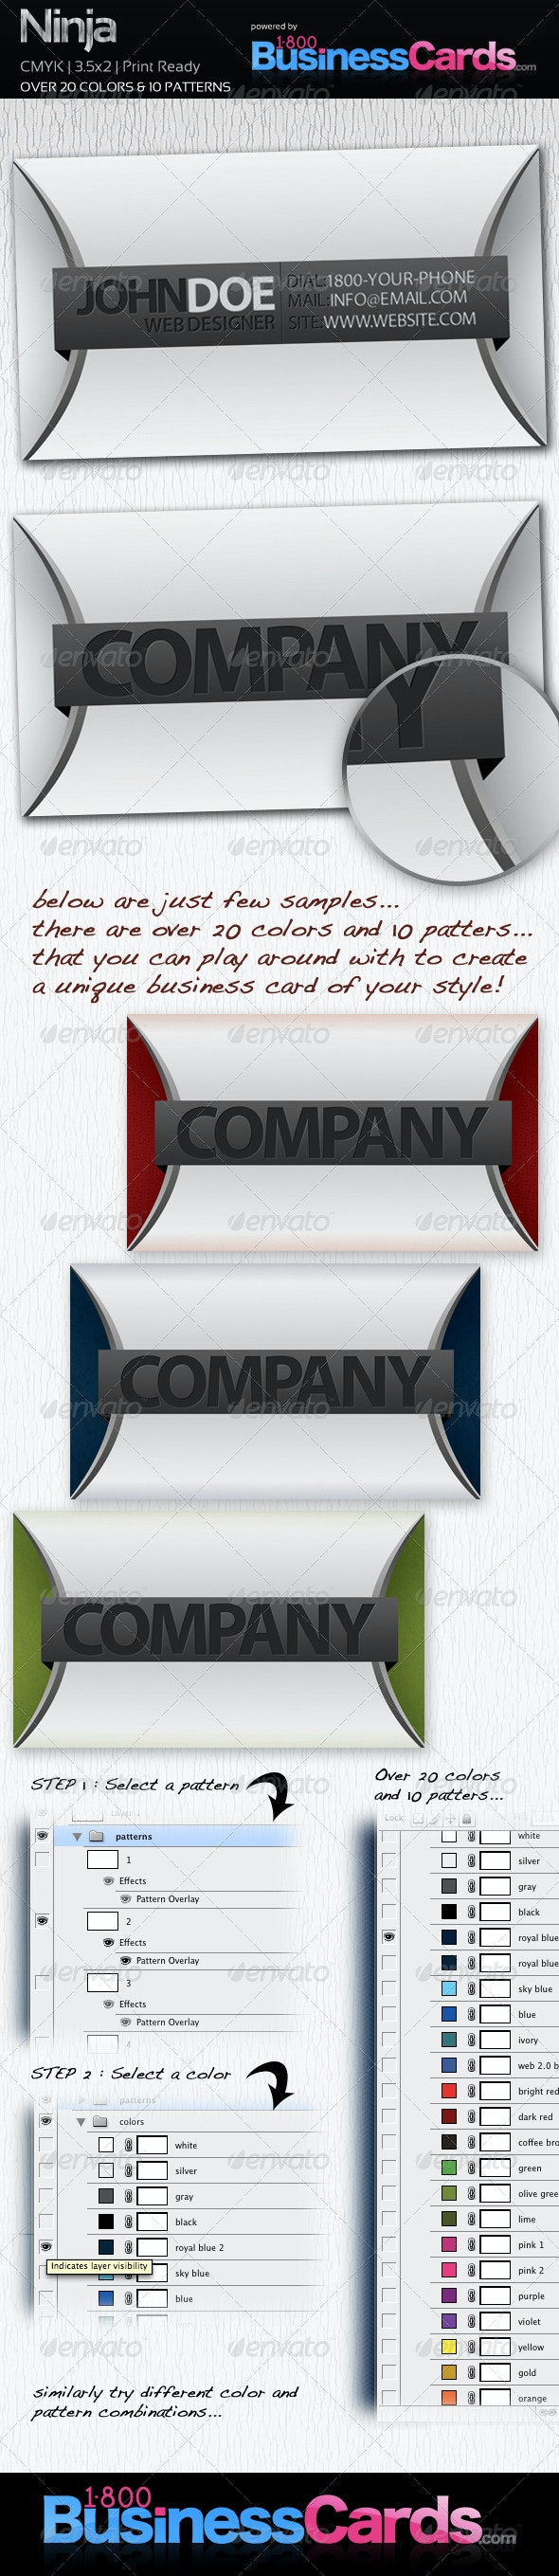 Ninja Business Card - Creative Business Cards